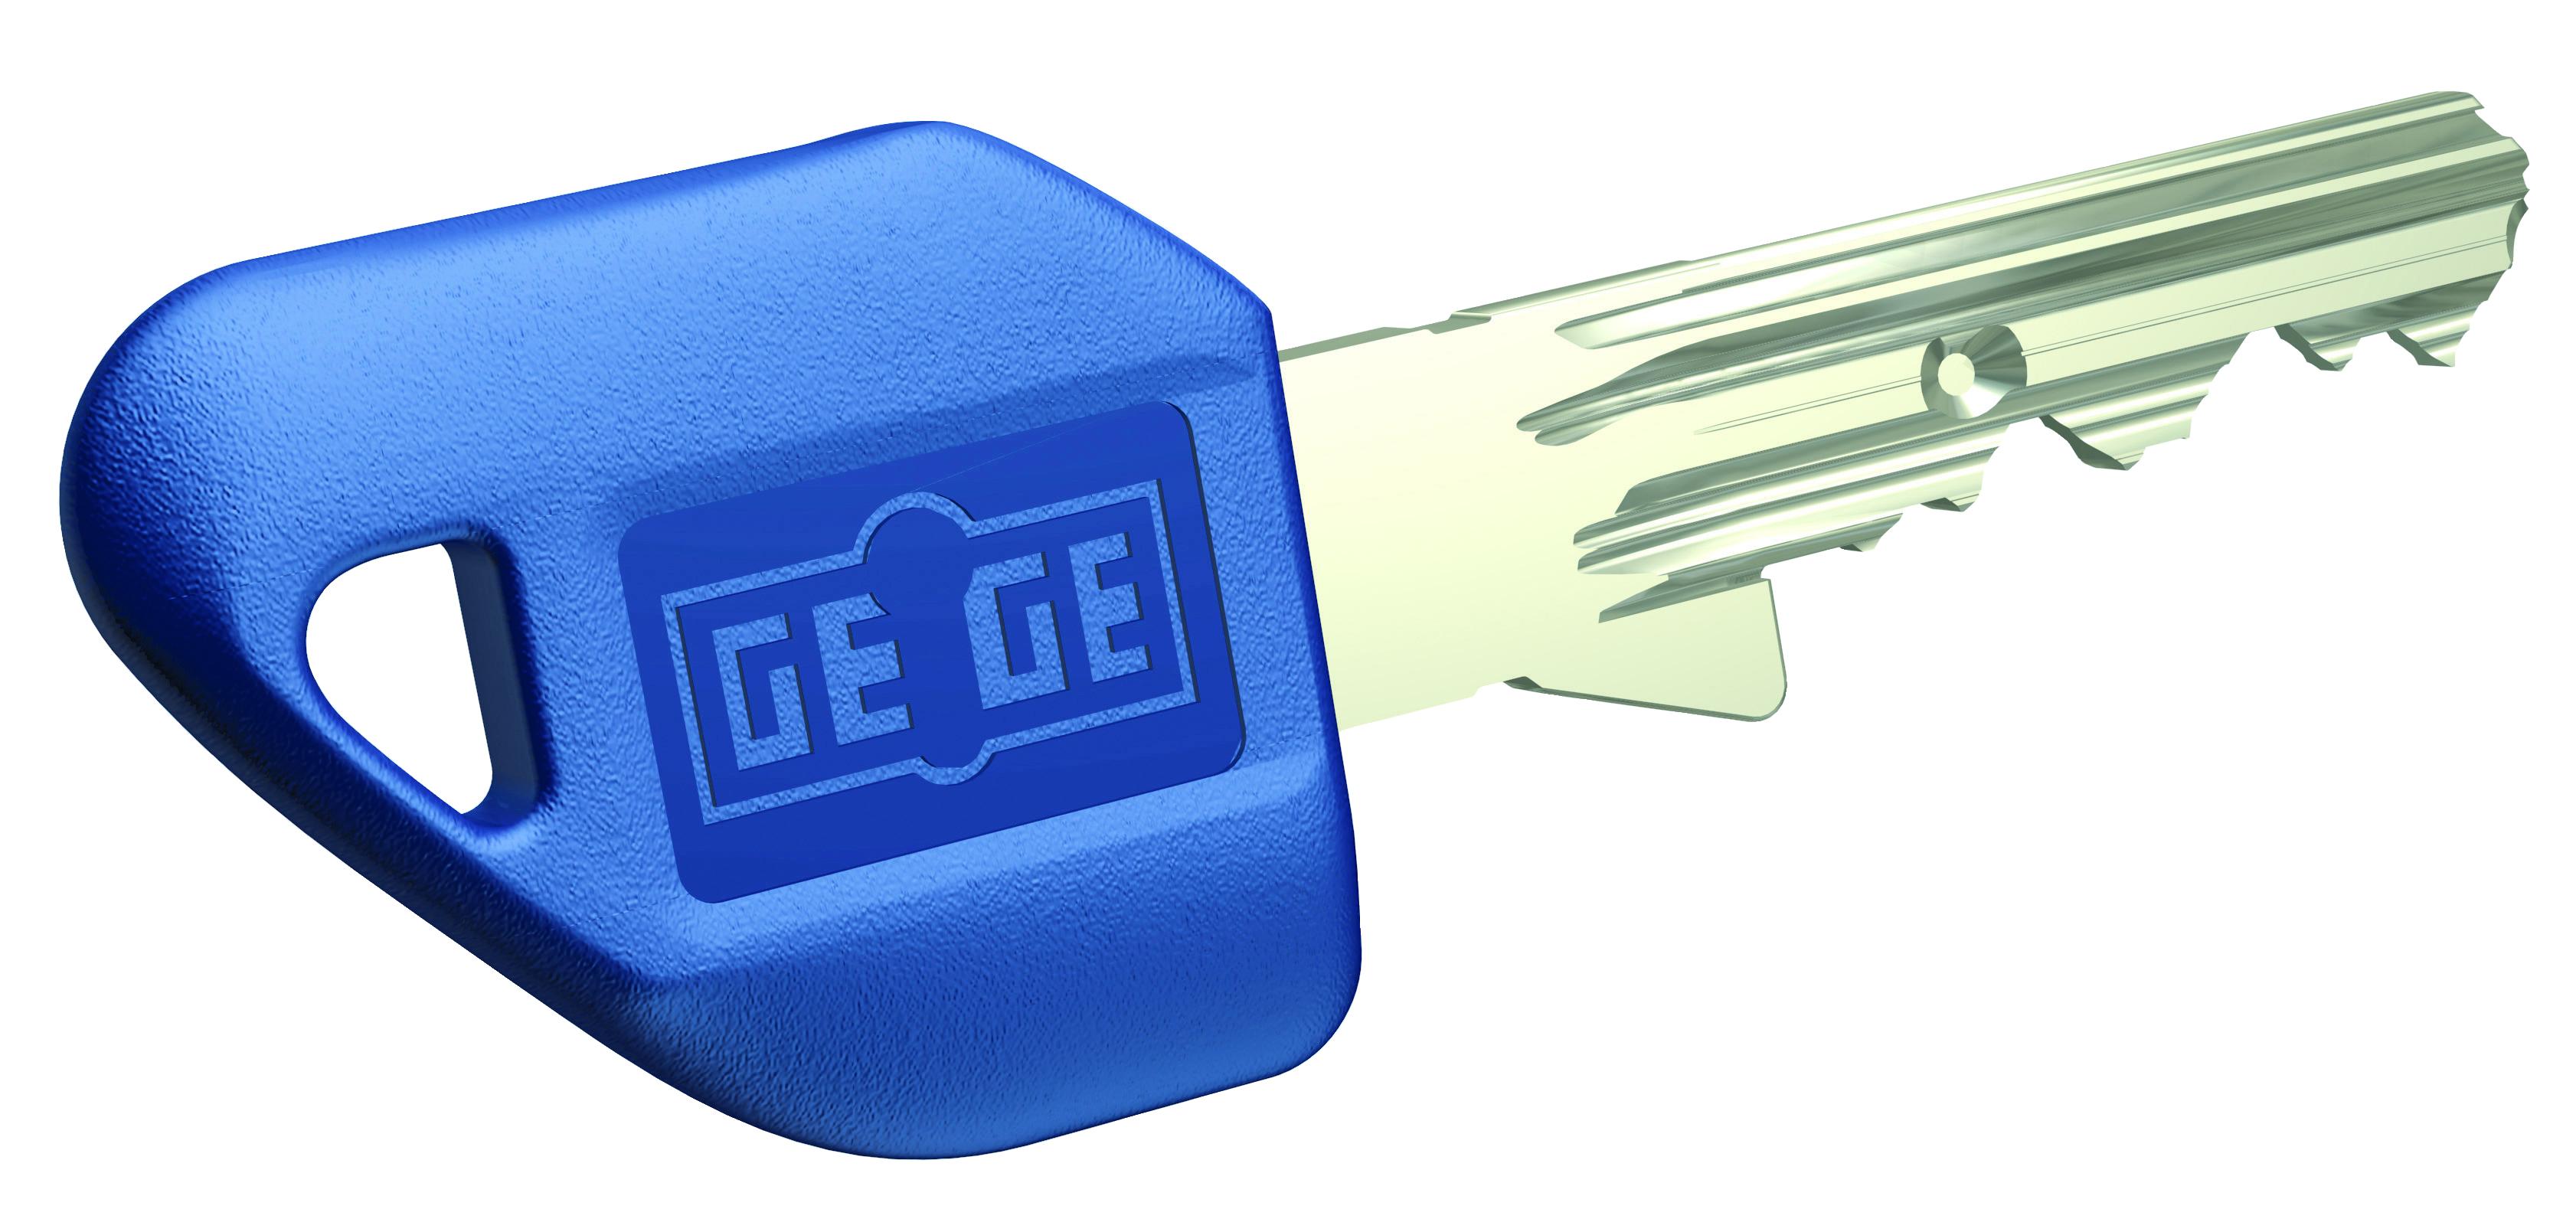 dormakaba gege pextra blue mavi anahtar